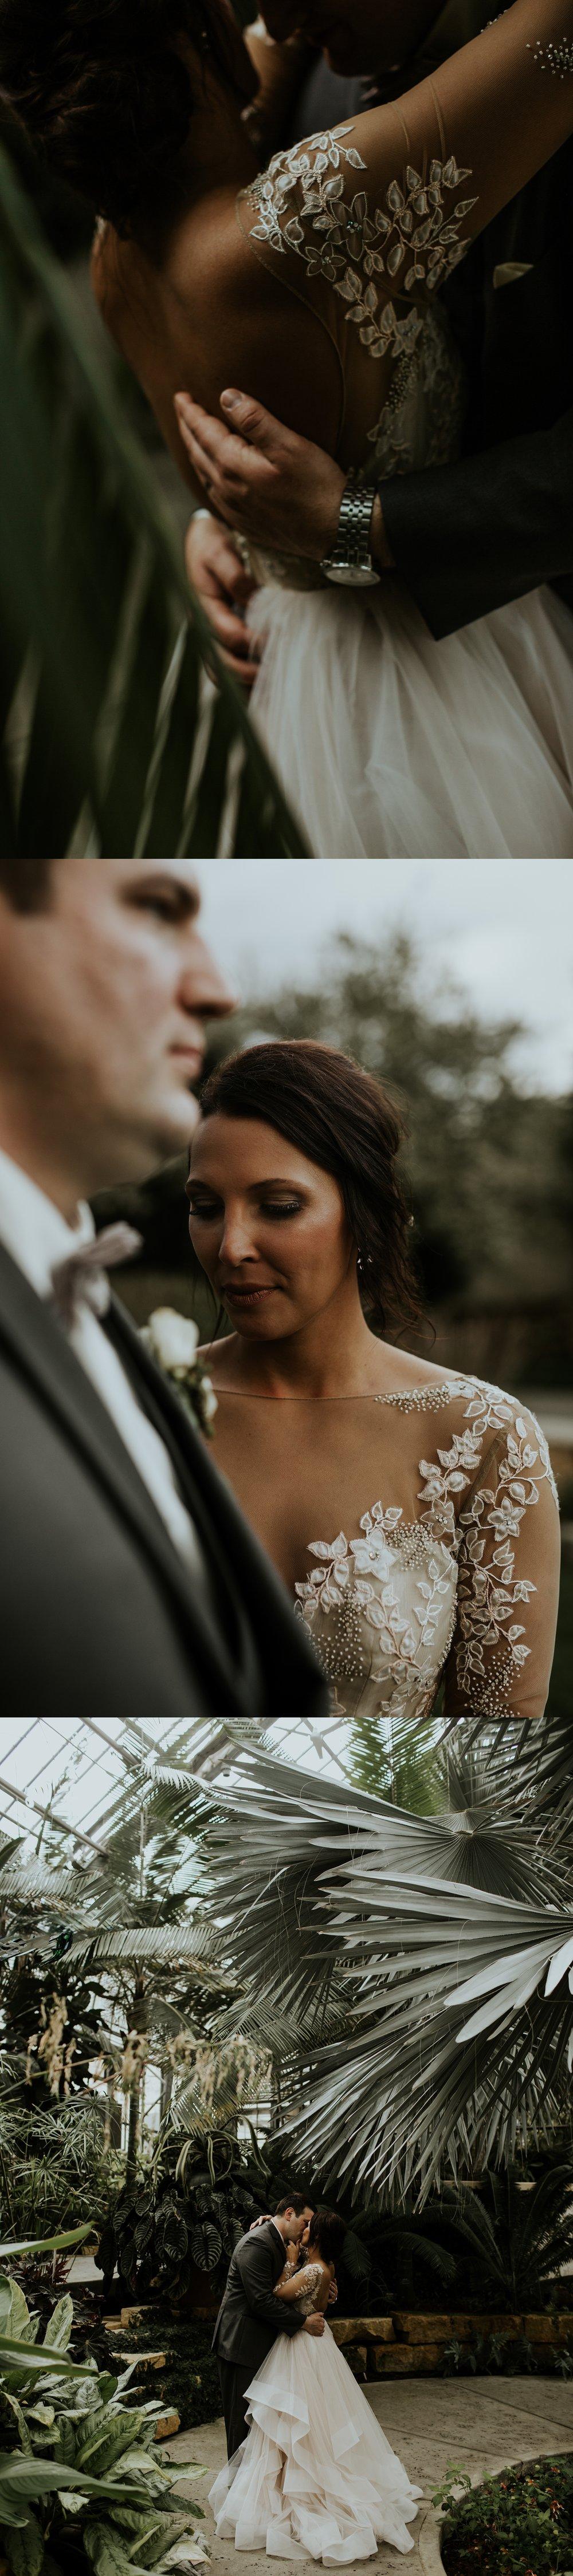 Romantic Lauritzen Gardens Omaha Wedding  - Trin Jensen Photography_0021.jpg